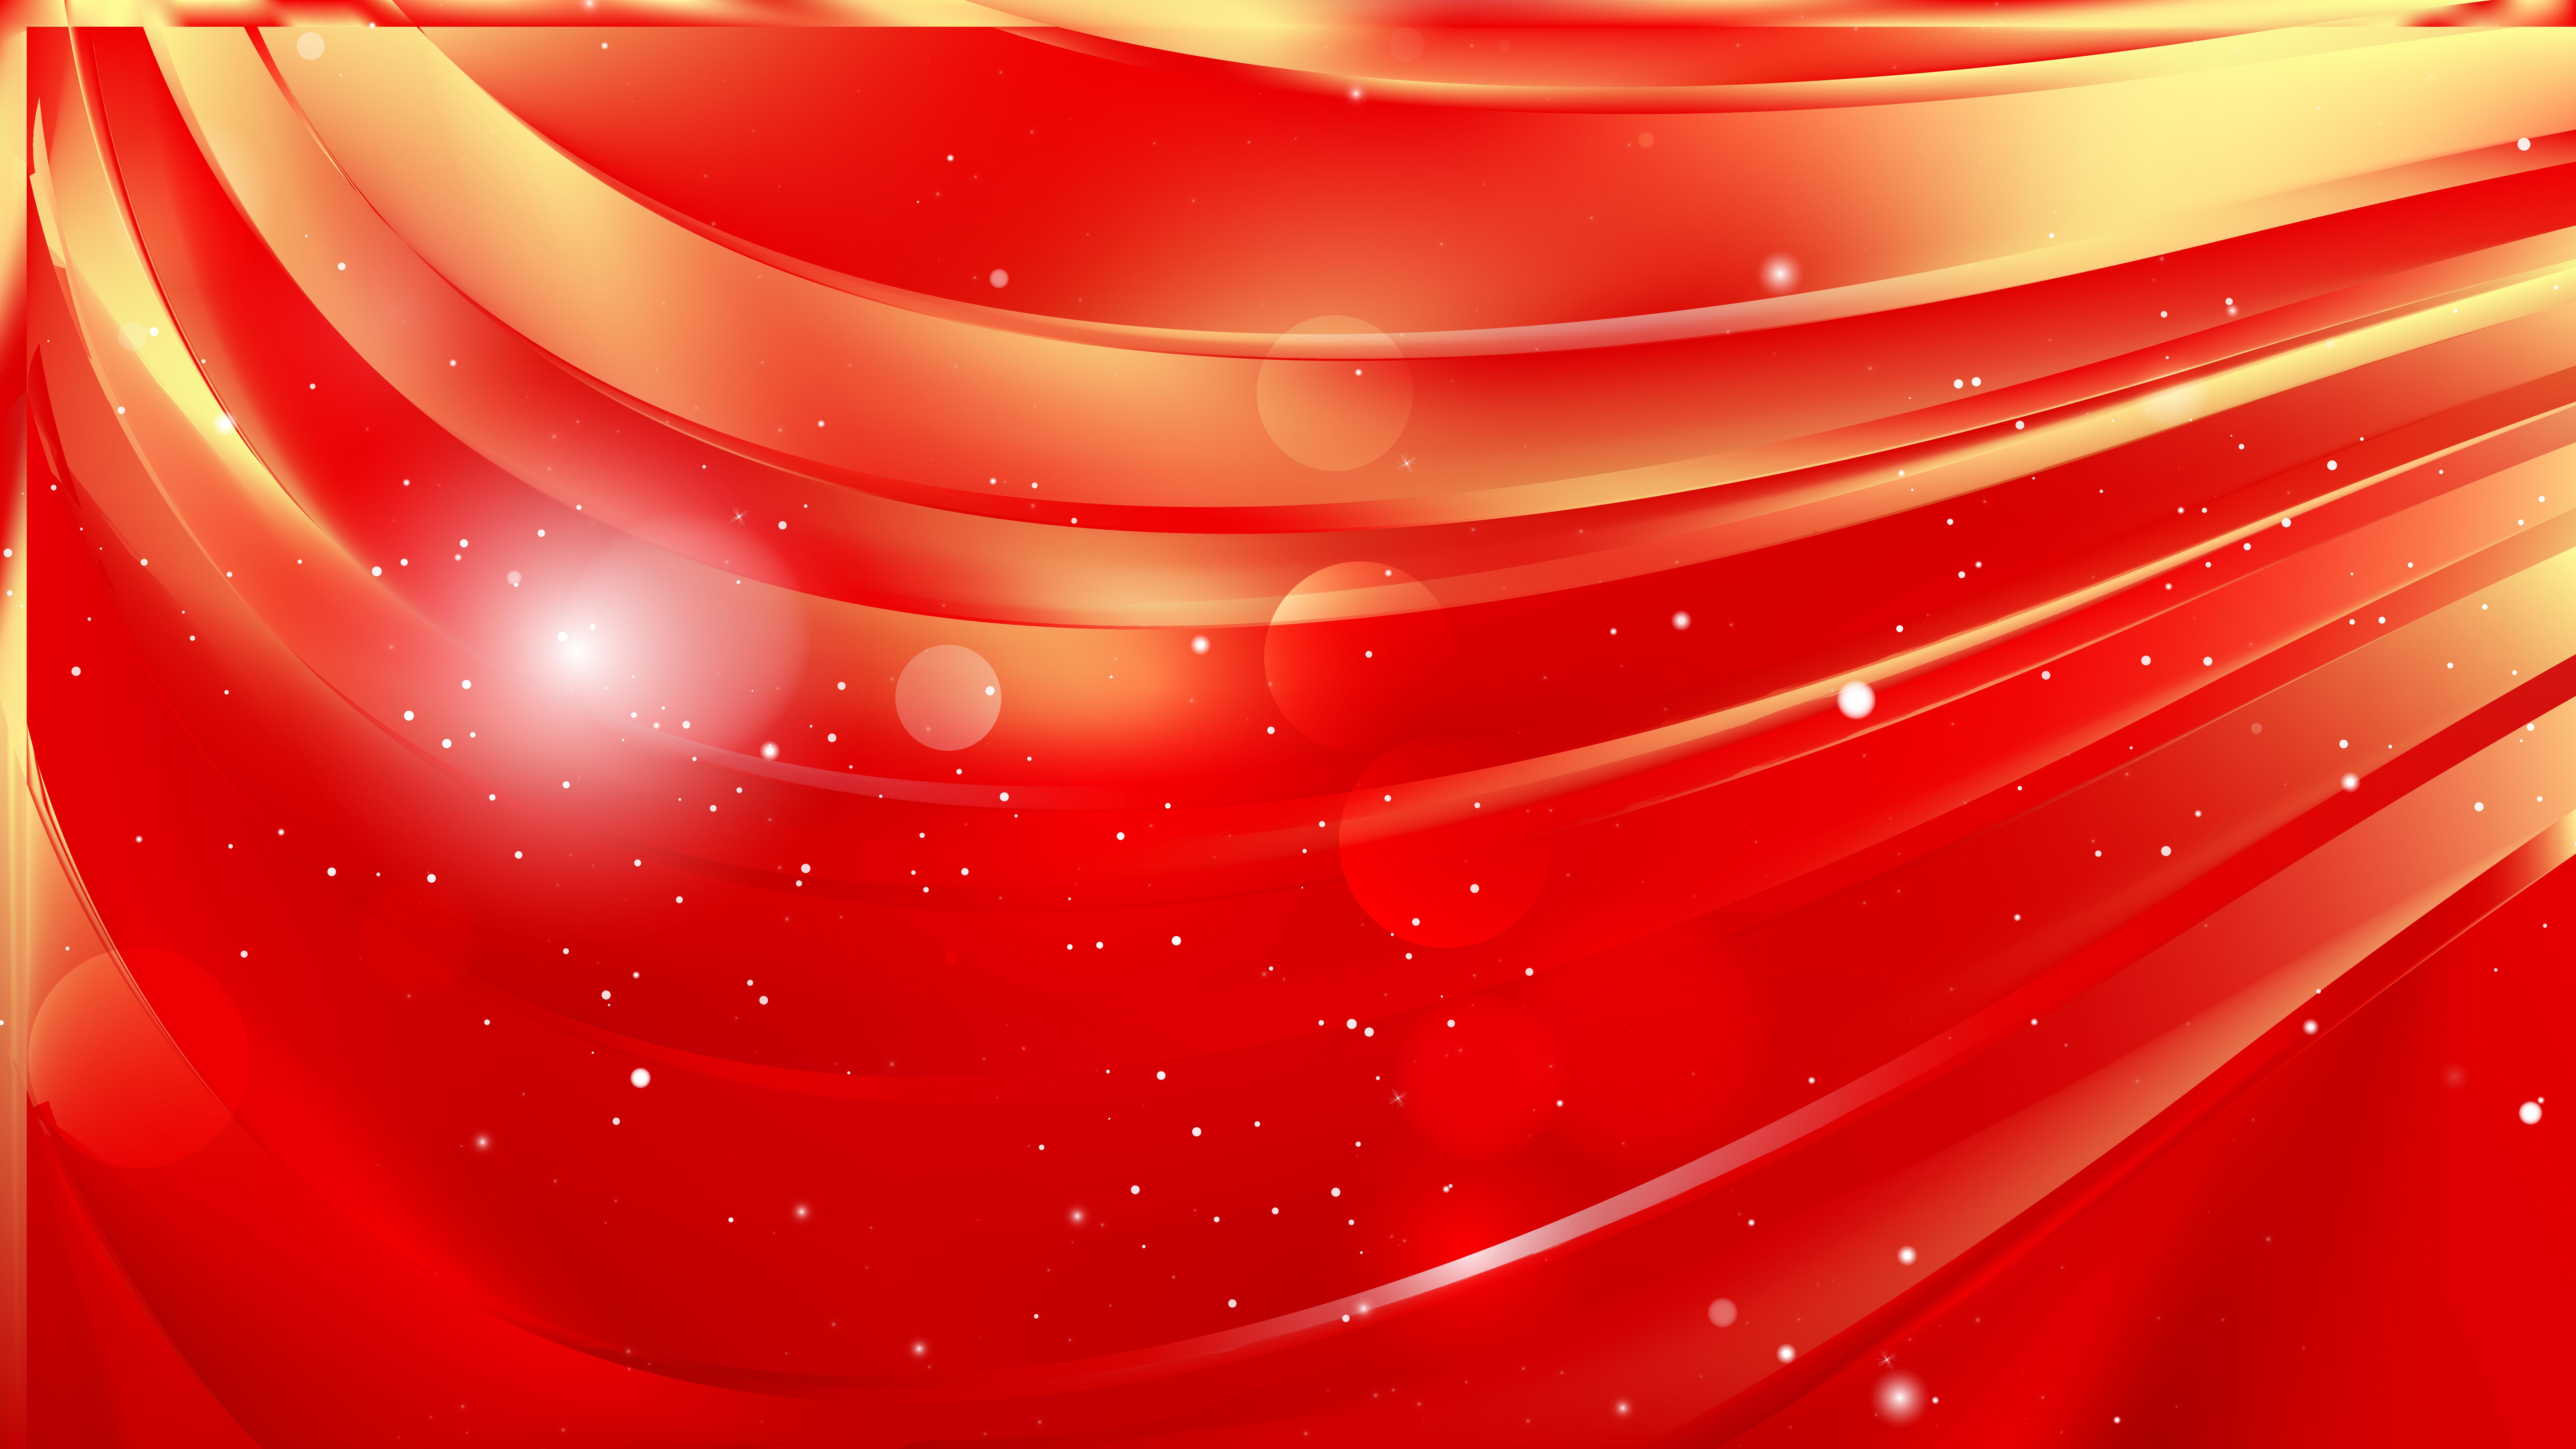 Red Background Background Merah Abstrak - Arini Gambar